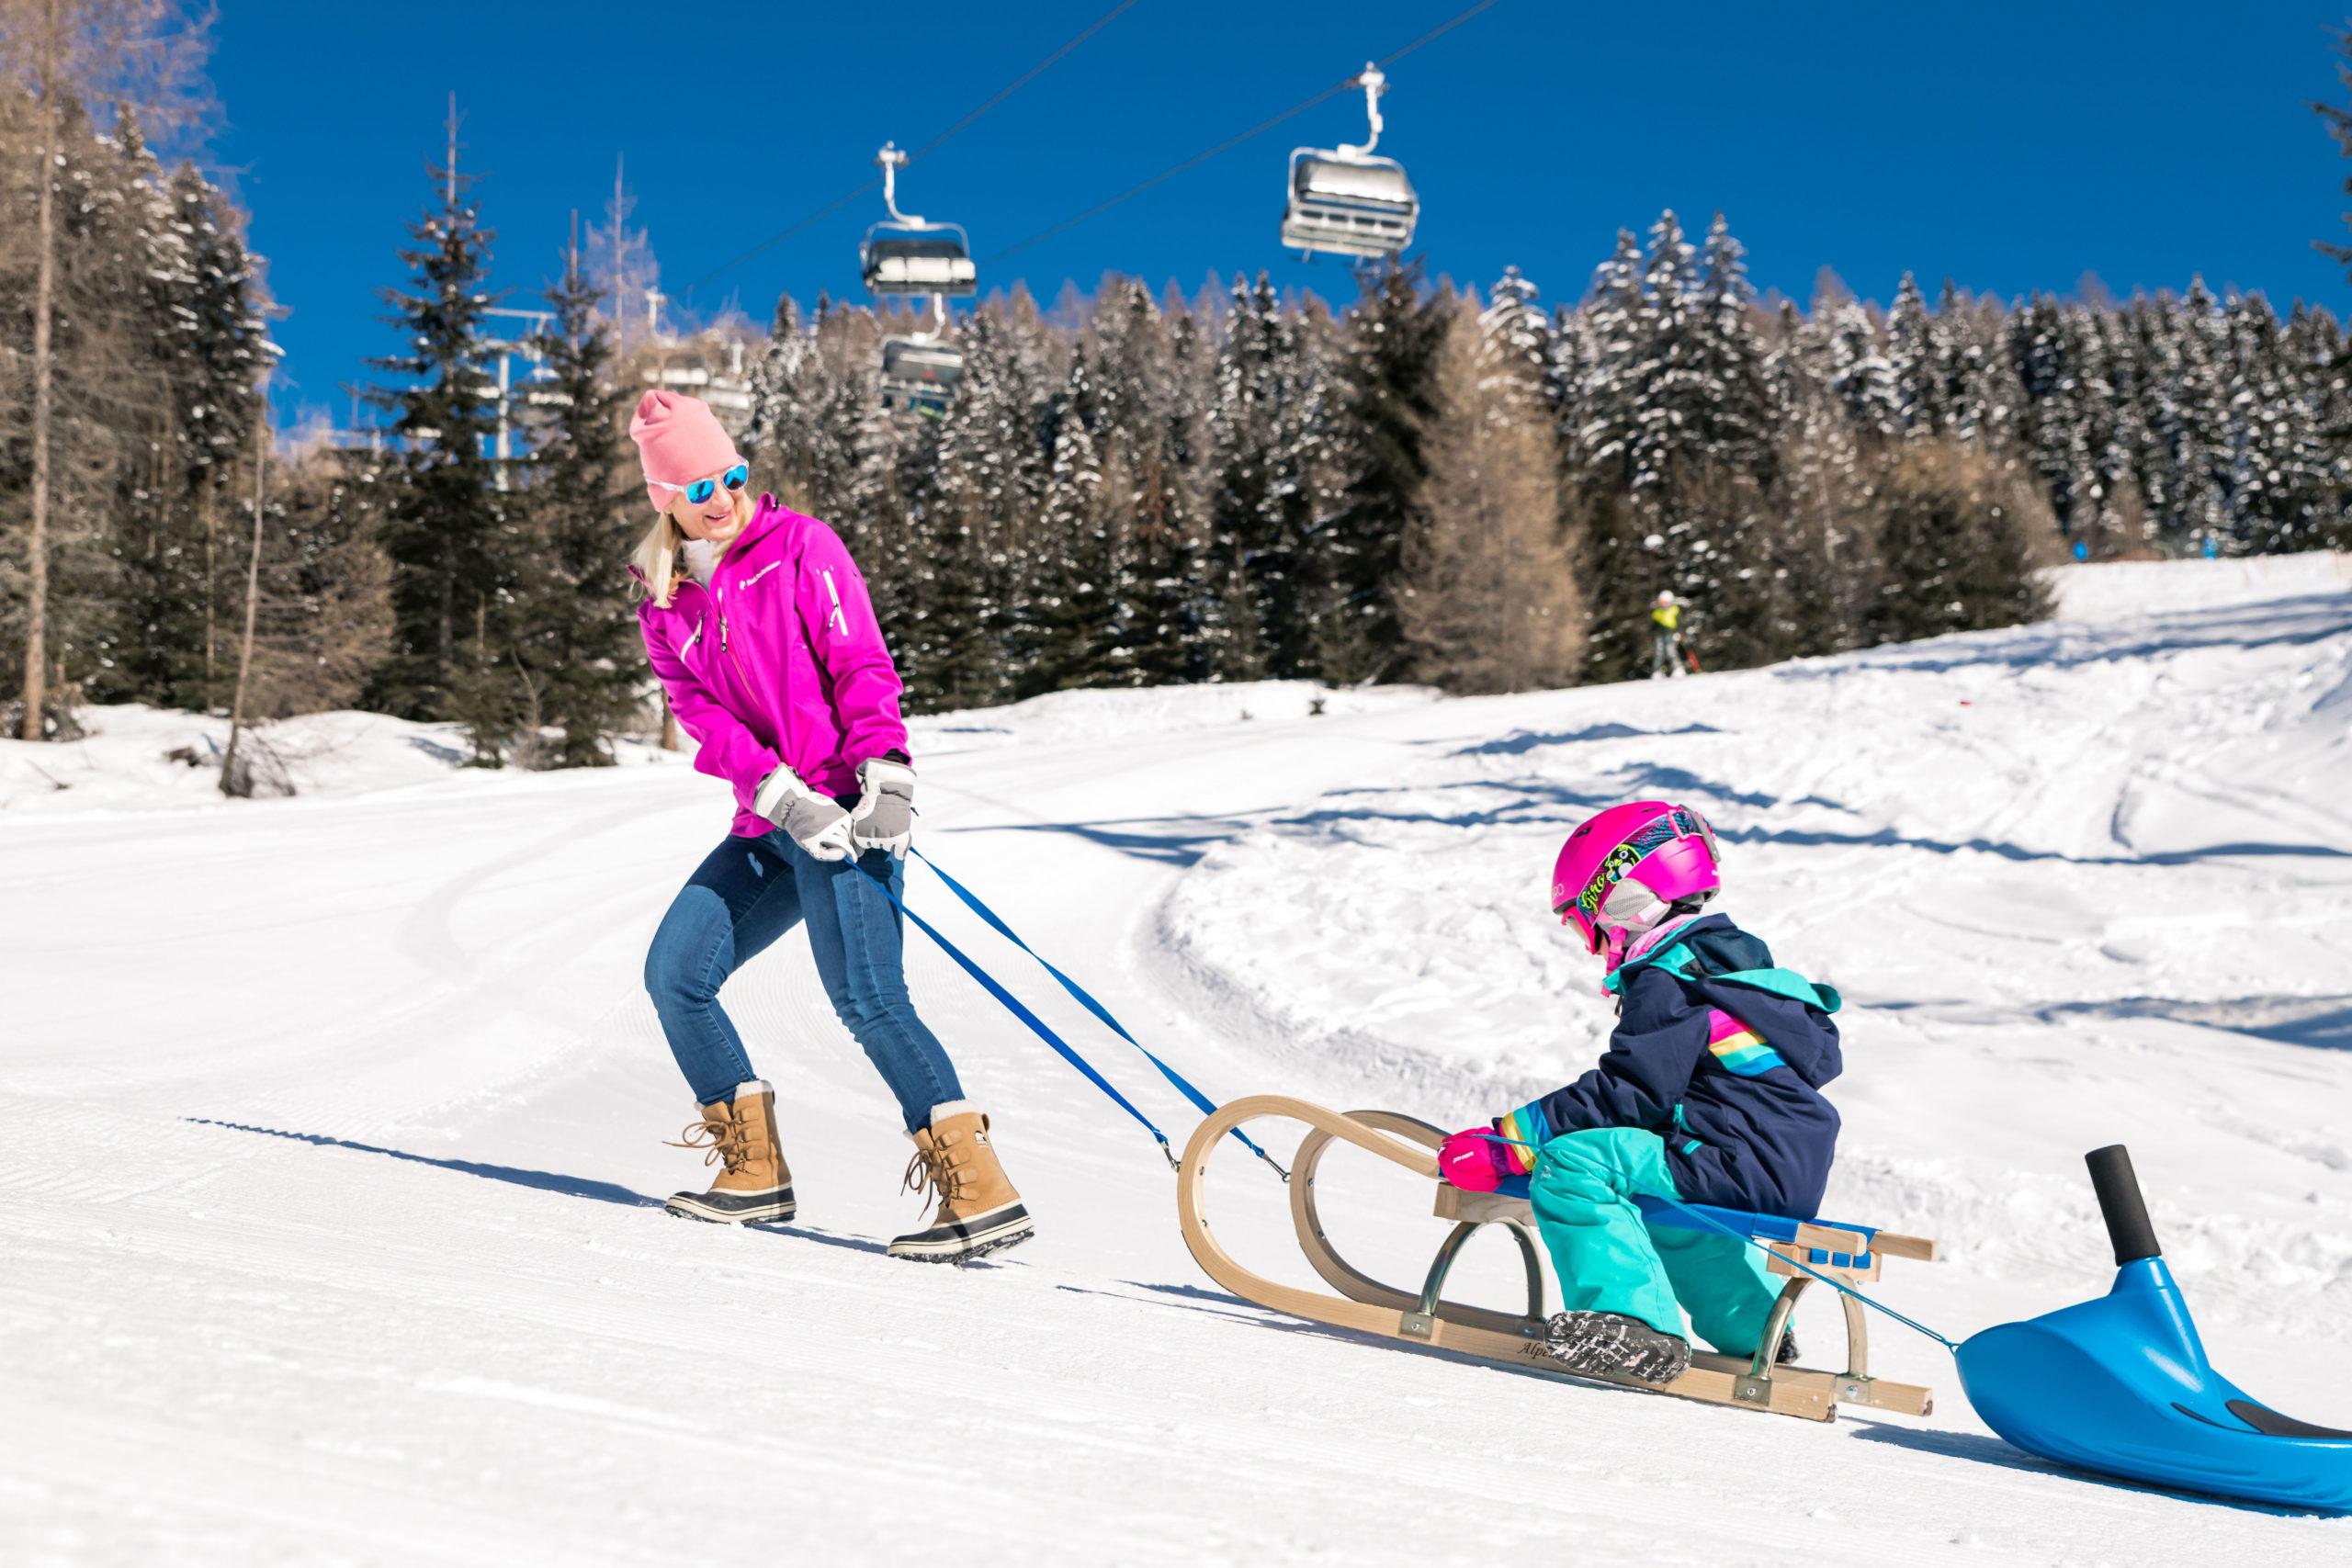 Kärntner Wintererlebnisse für die Kids